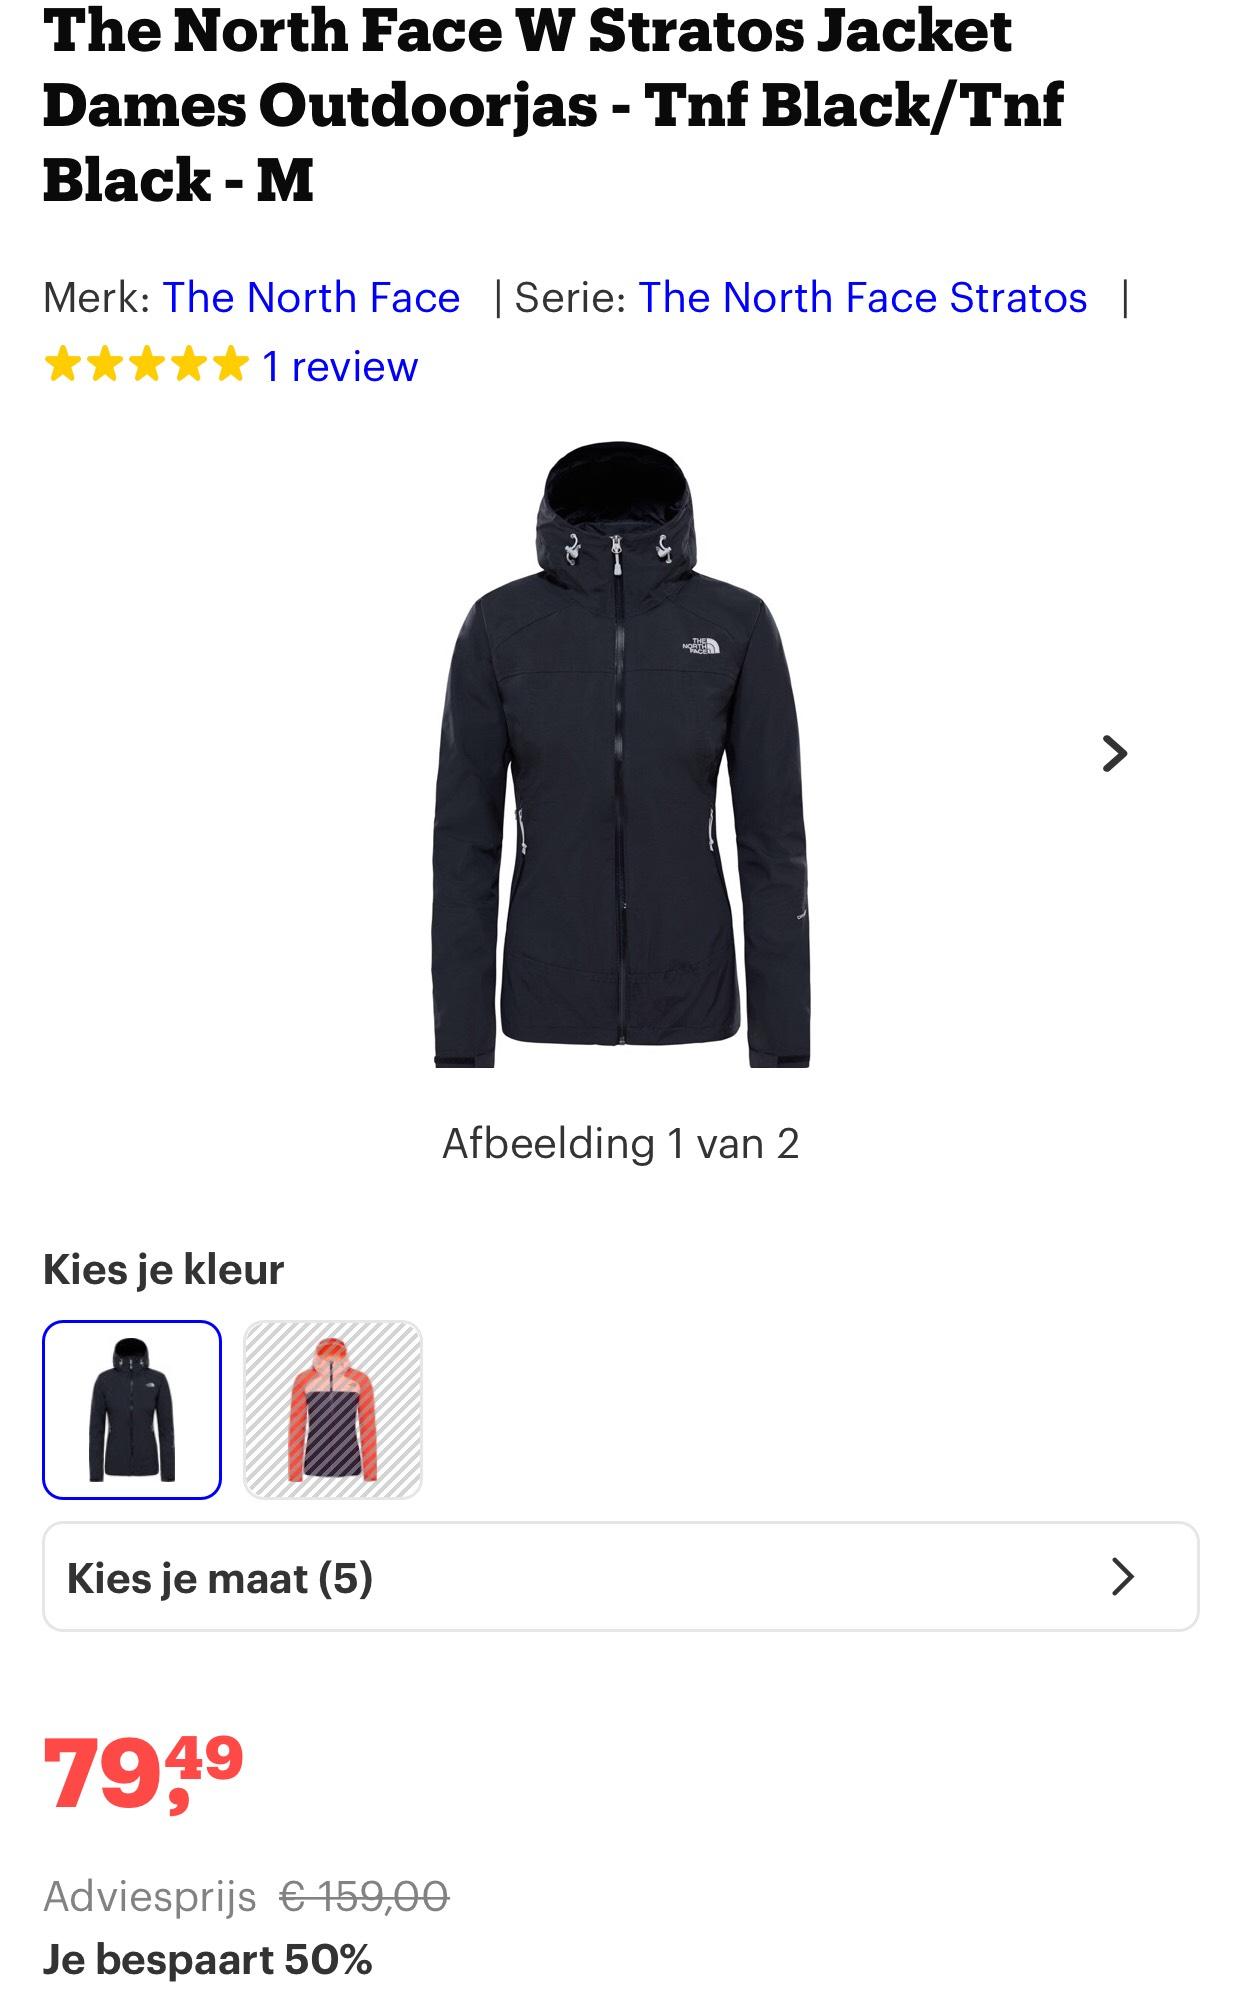 The North Face W Stratos Jacket Dames Outdoorjas - Tnf Black/Tnf Black - M  50% korting (bol.com)